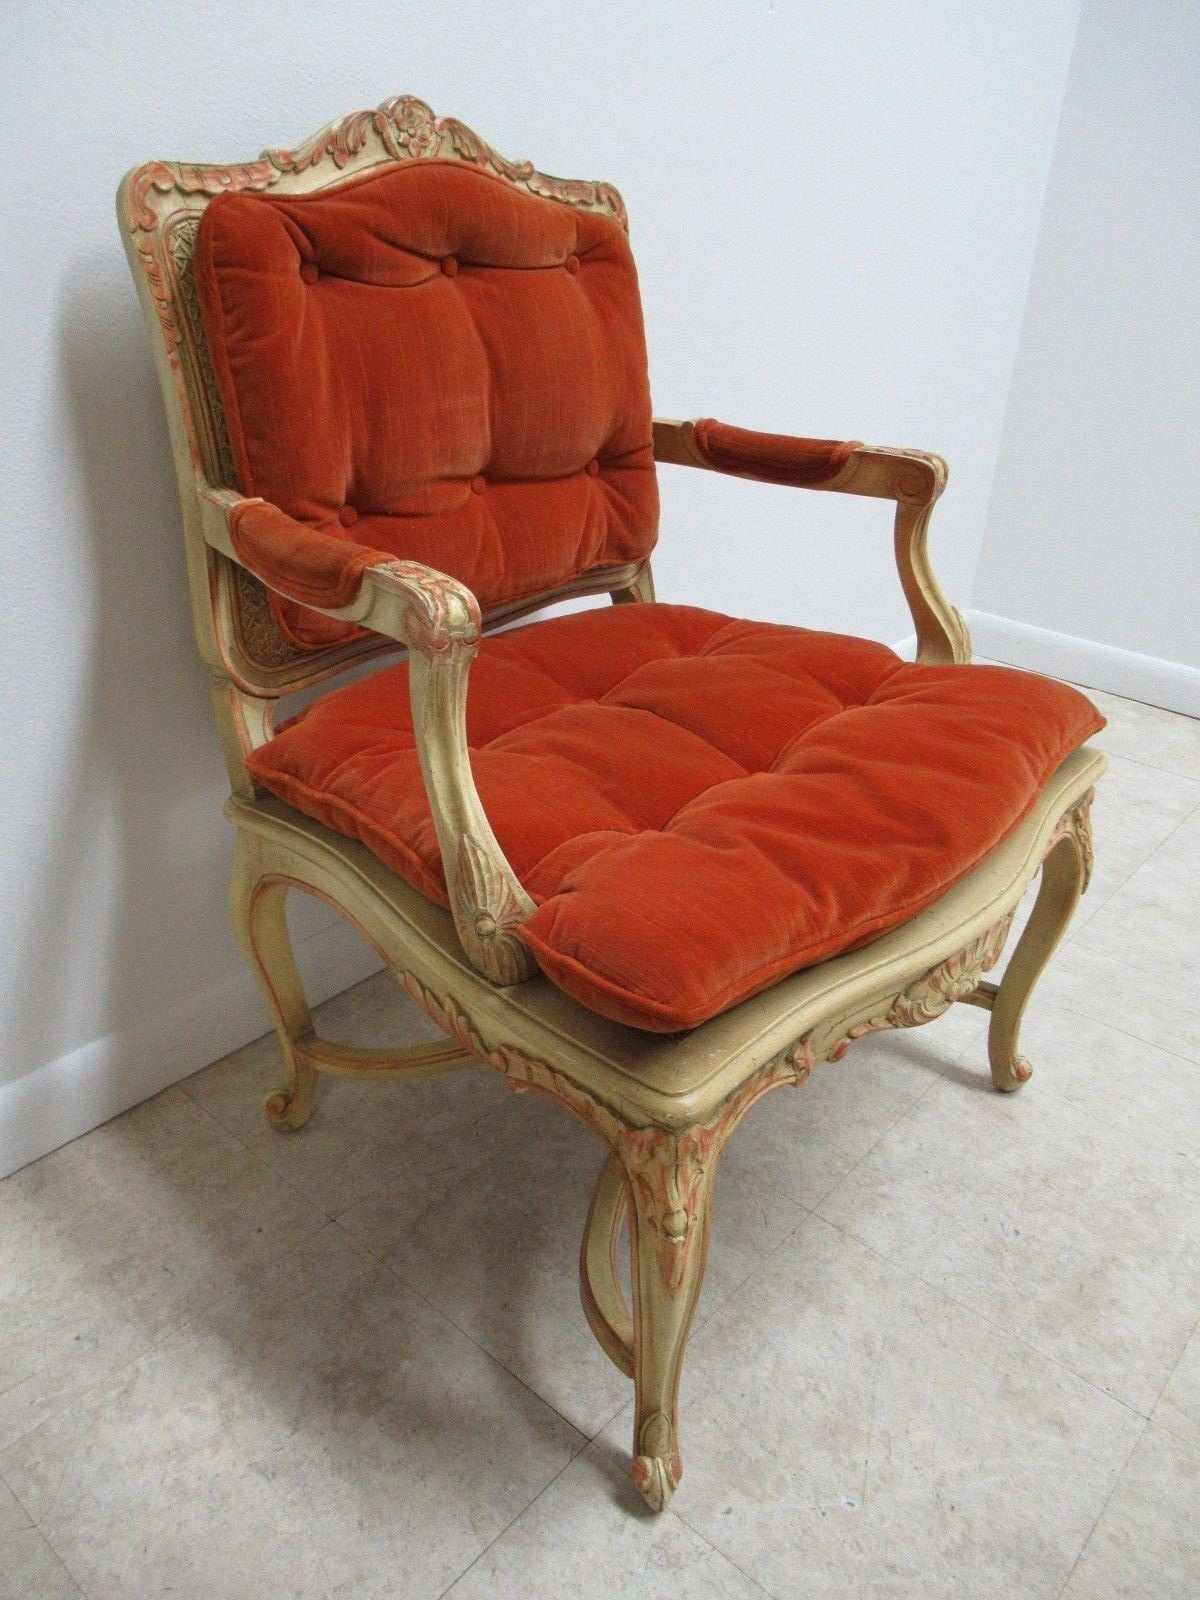 A Vintage French Regency Paint Decorated Cane Armchair. Measurements ( L X  W X H